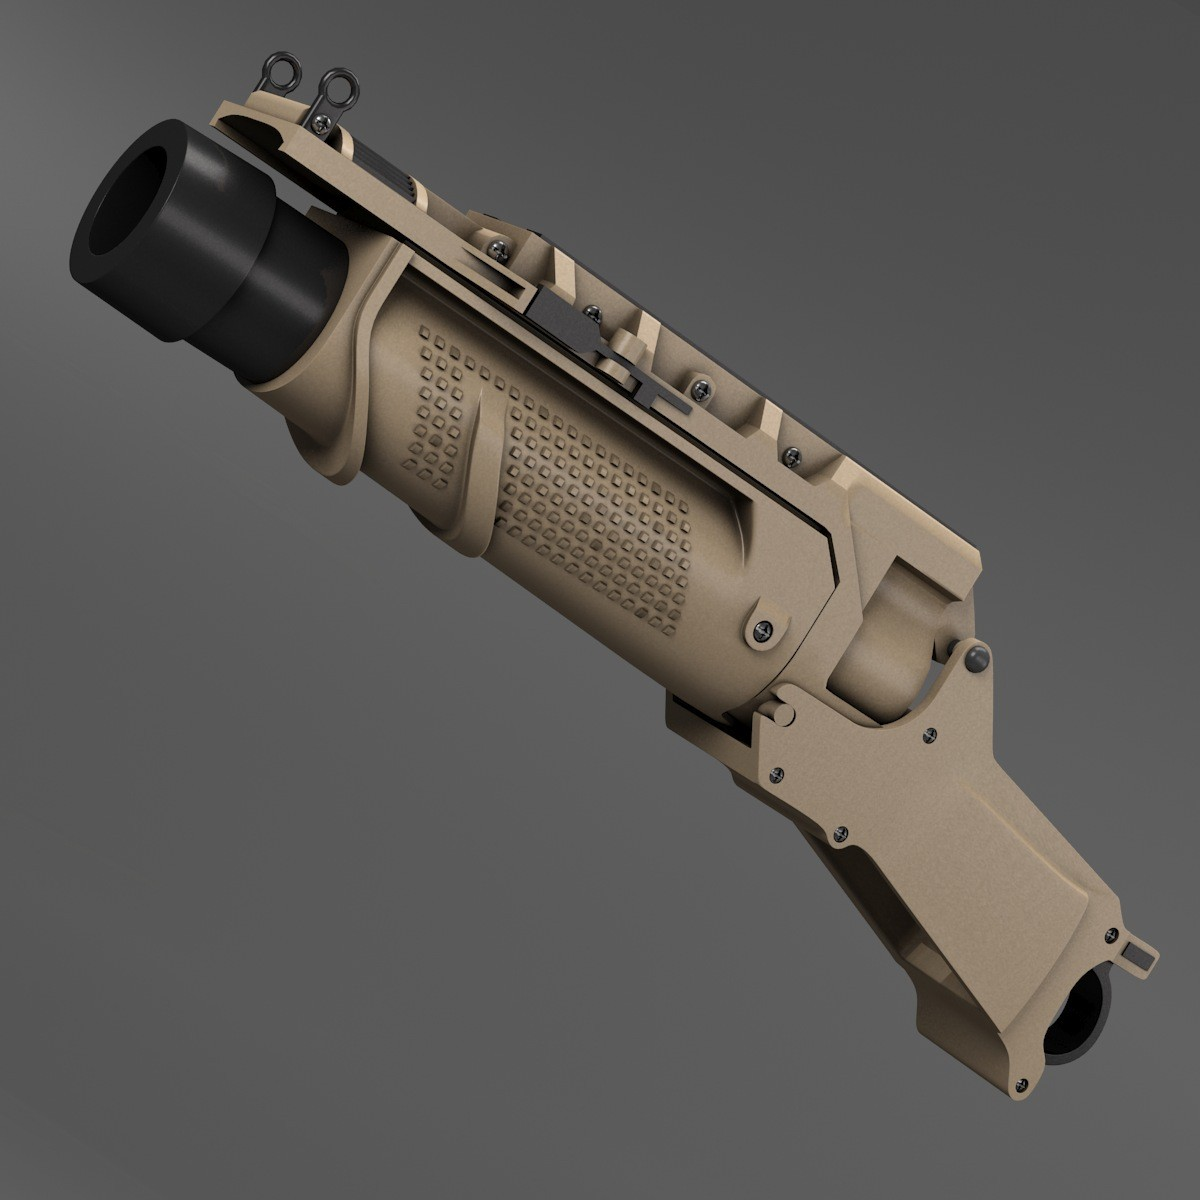 EGLM ARES SCAR Grenade Launcher (TAN) (Tan)